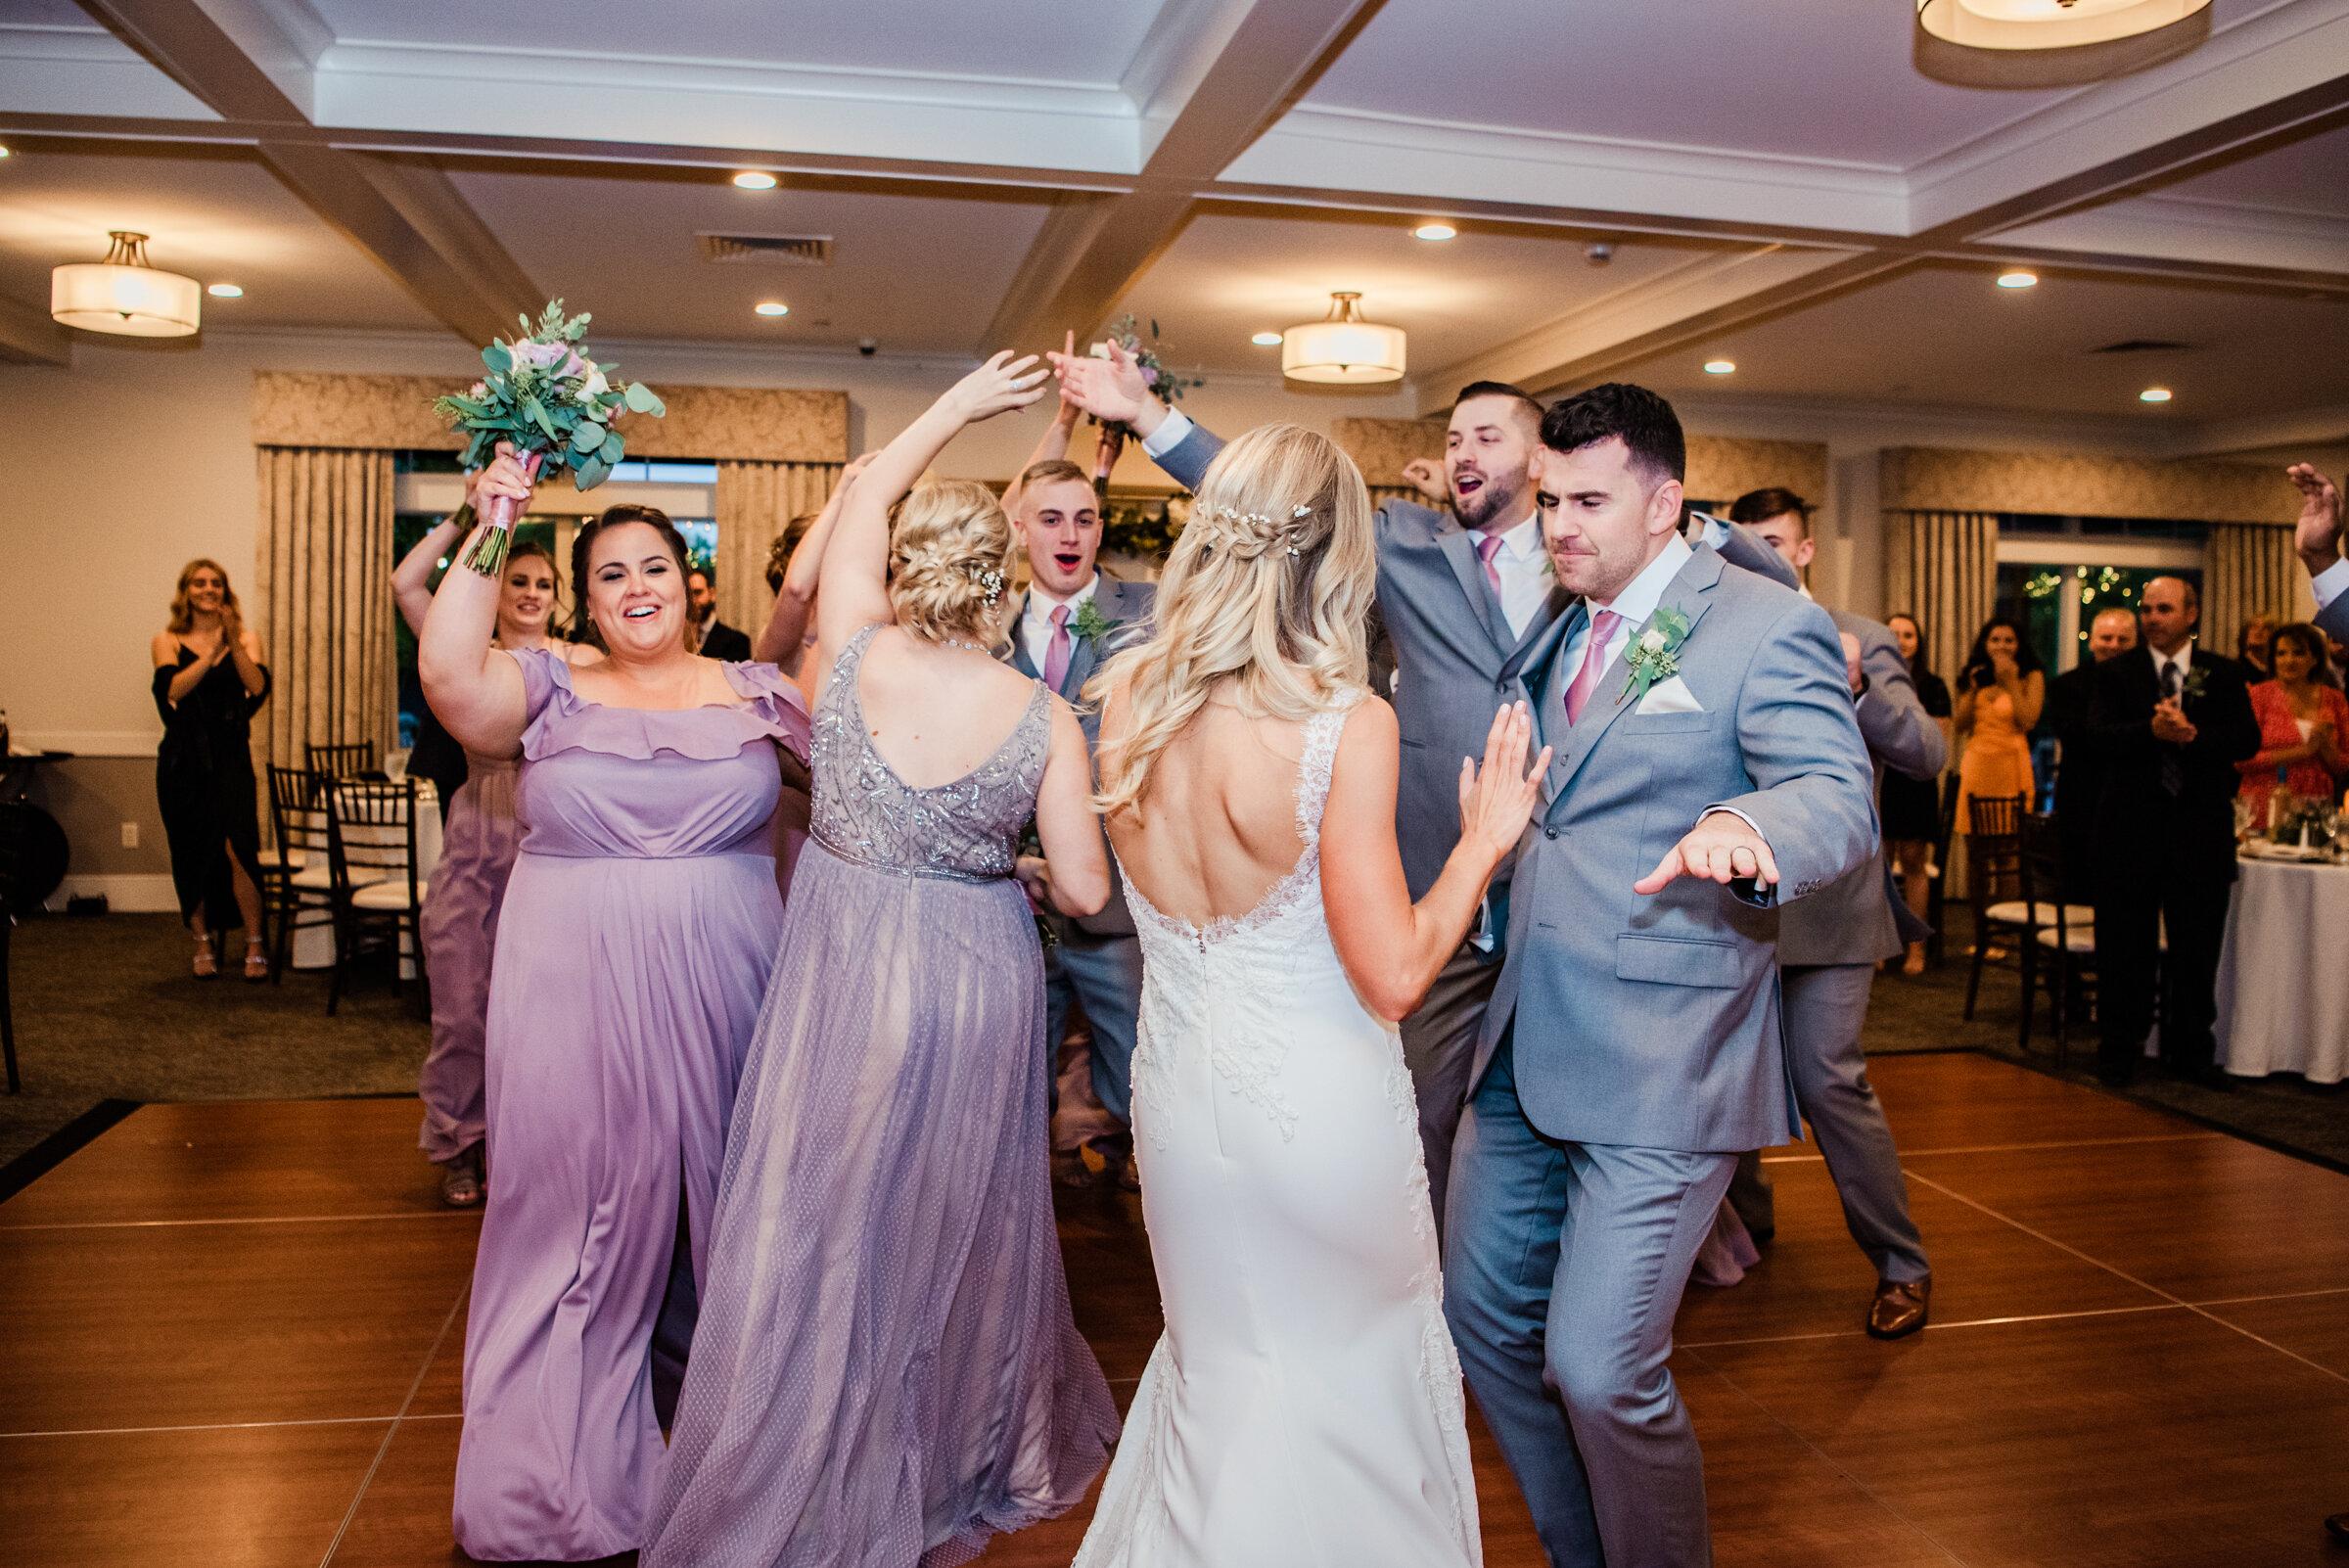 Deerfield_Country_Club_Rochester_Wedding_JILL_STUDIO_Rochester_NY_Photographer_DSC_7104.jpg